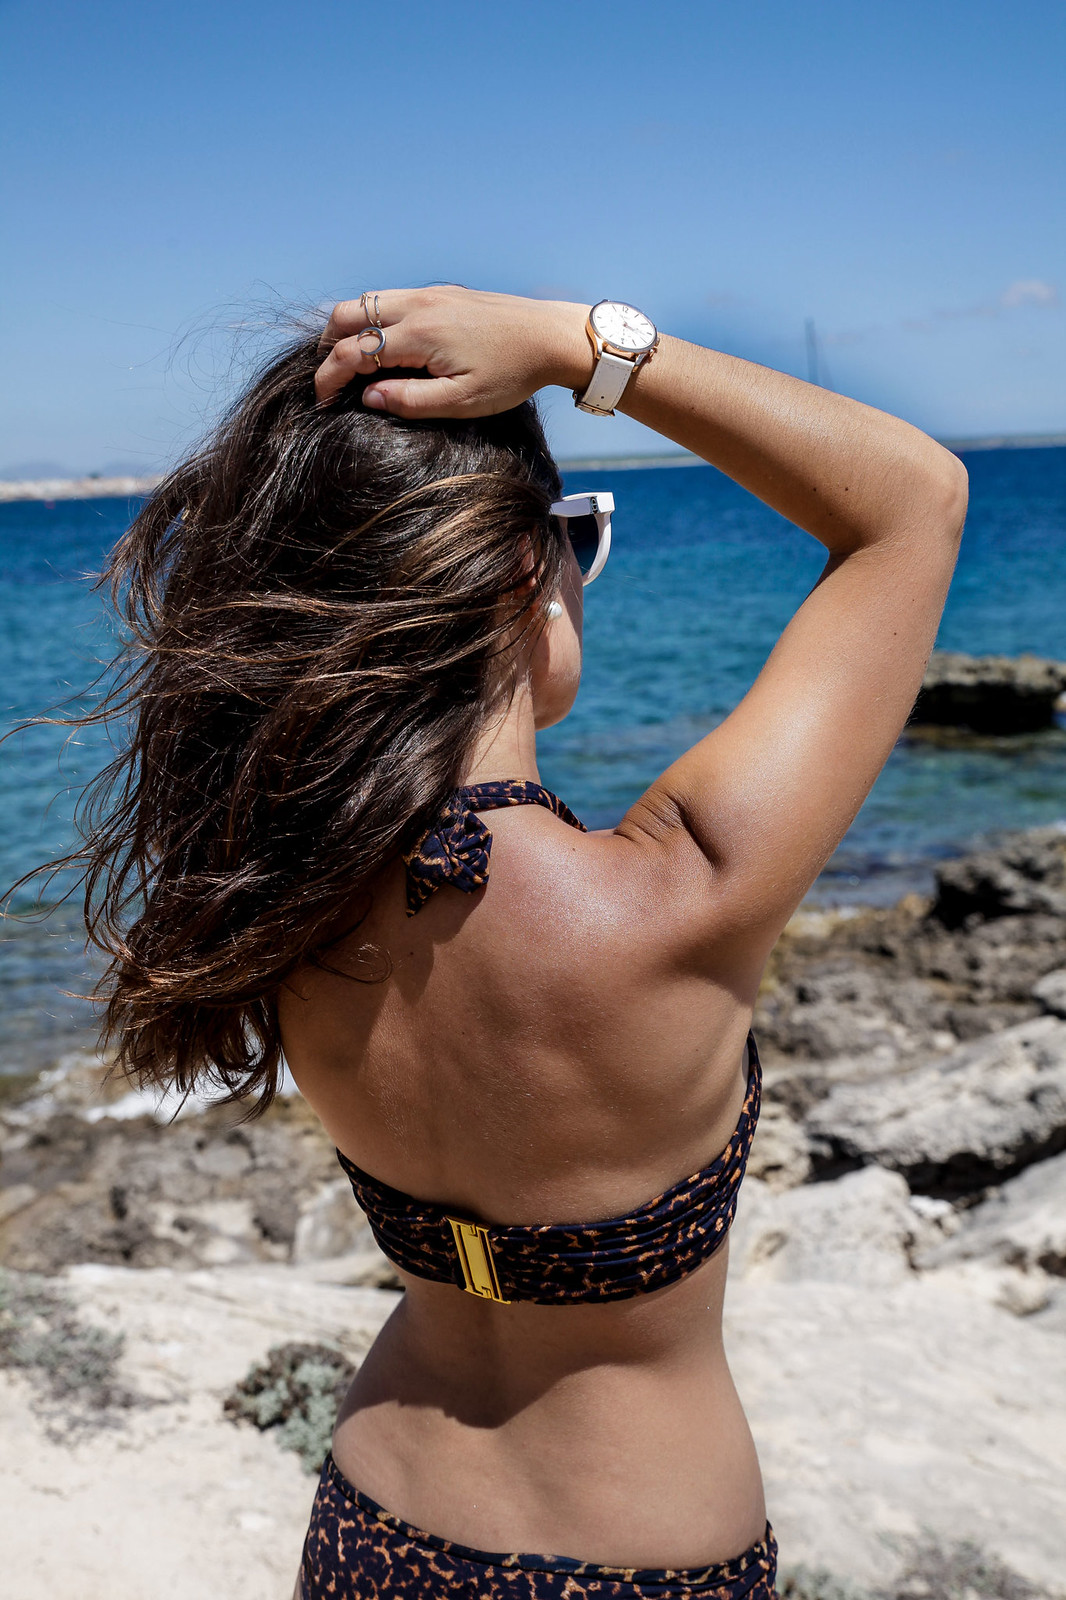 08_beachriot_leopard_swimwear_theguestgirl_summer_the_guest_girl_laura_santolaria_mediterranean_girl_mejor_bañador_2017_bikini_sexy_laura